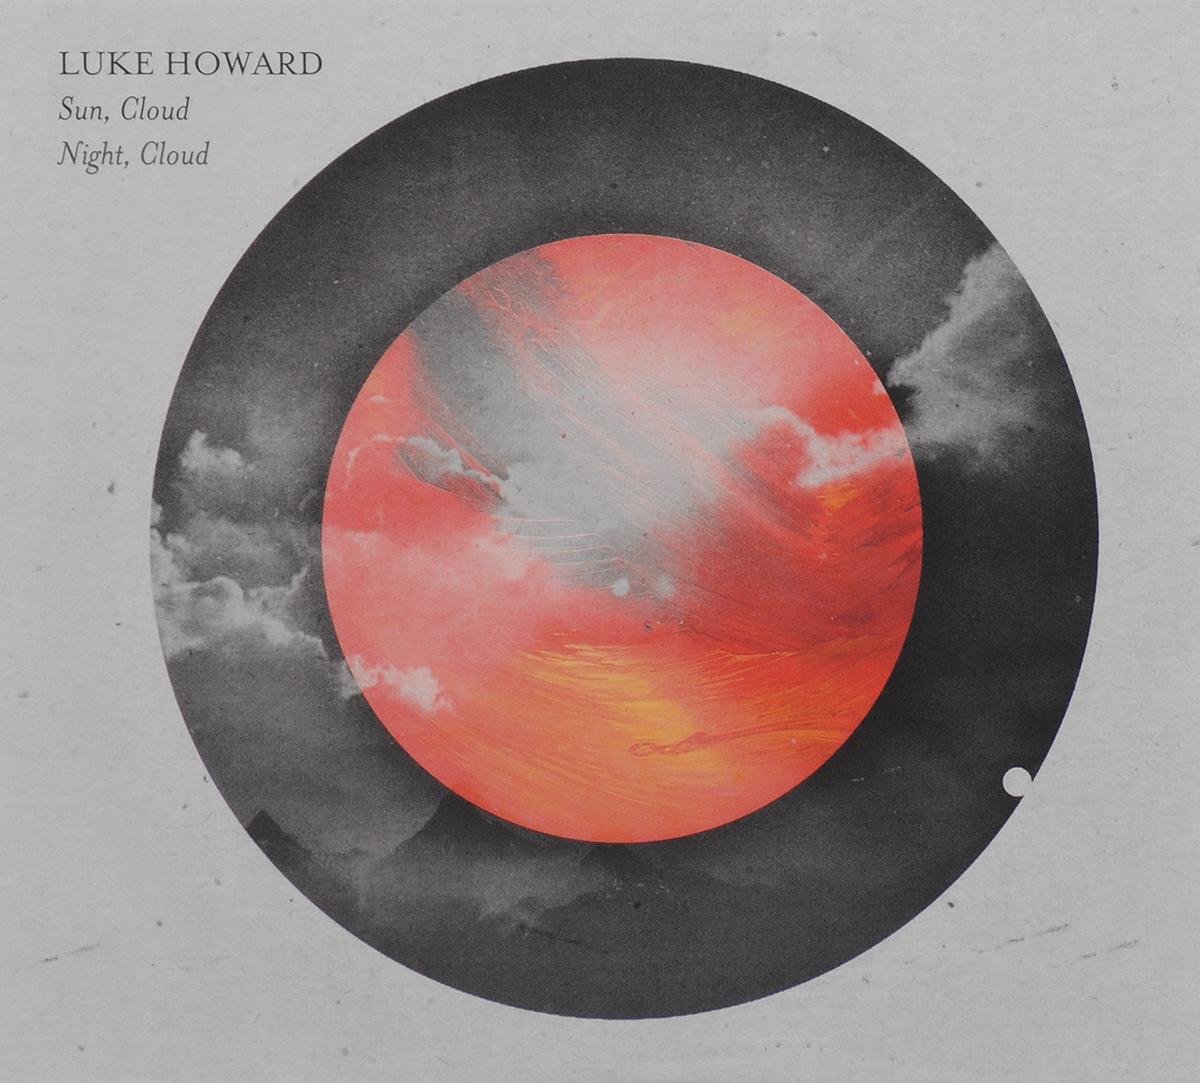 цена на Luke Howard Luke Howard. Sun Cloud: Night Cloud